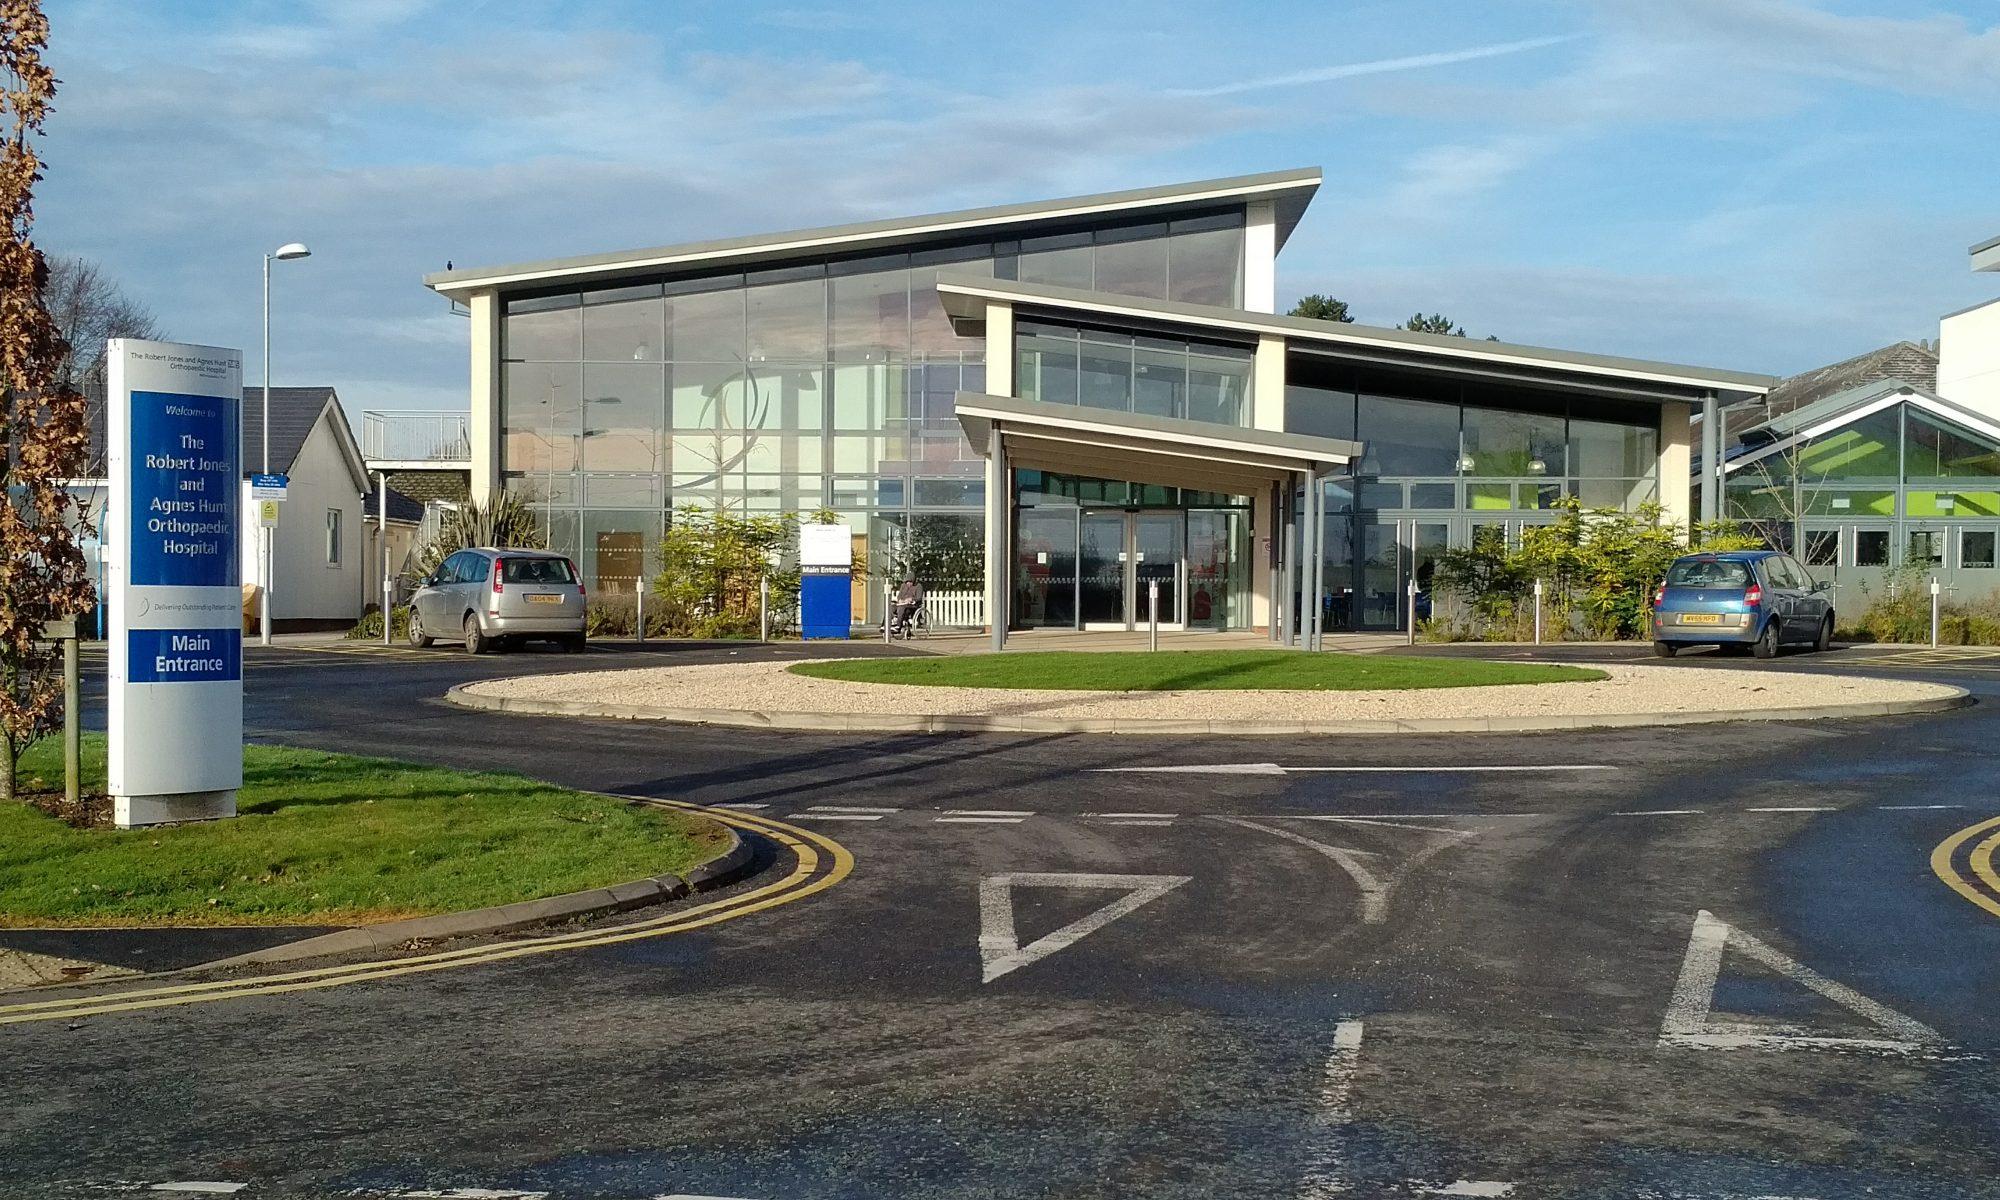 NHS & Social Care: Orthopaedic Hospital in Gobowen